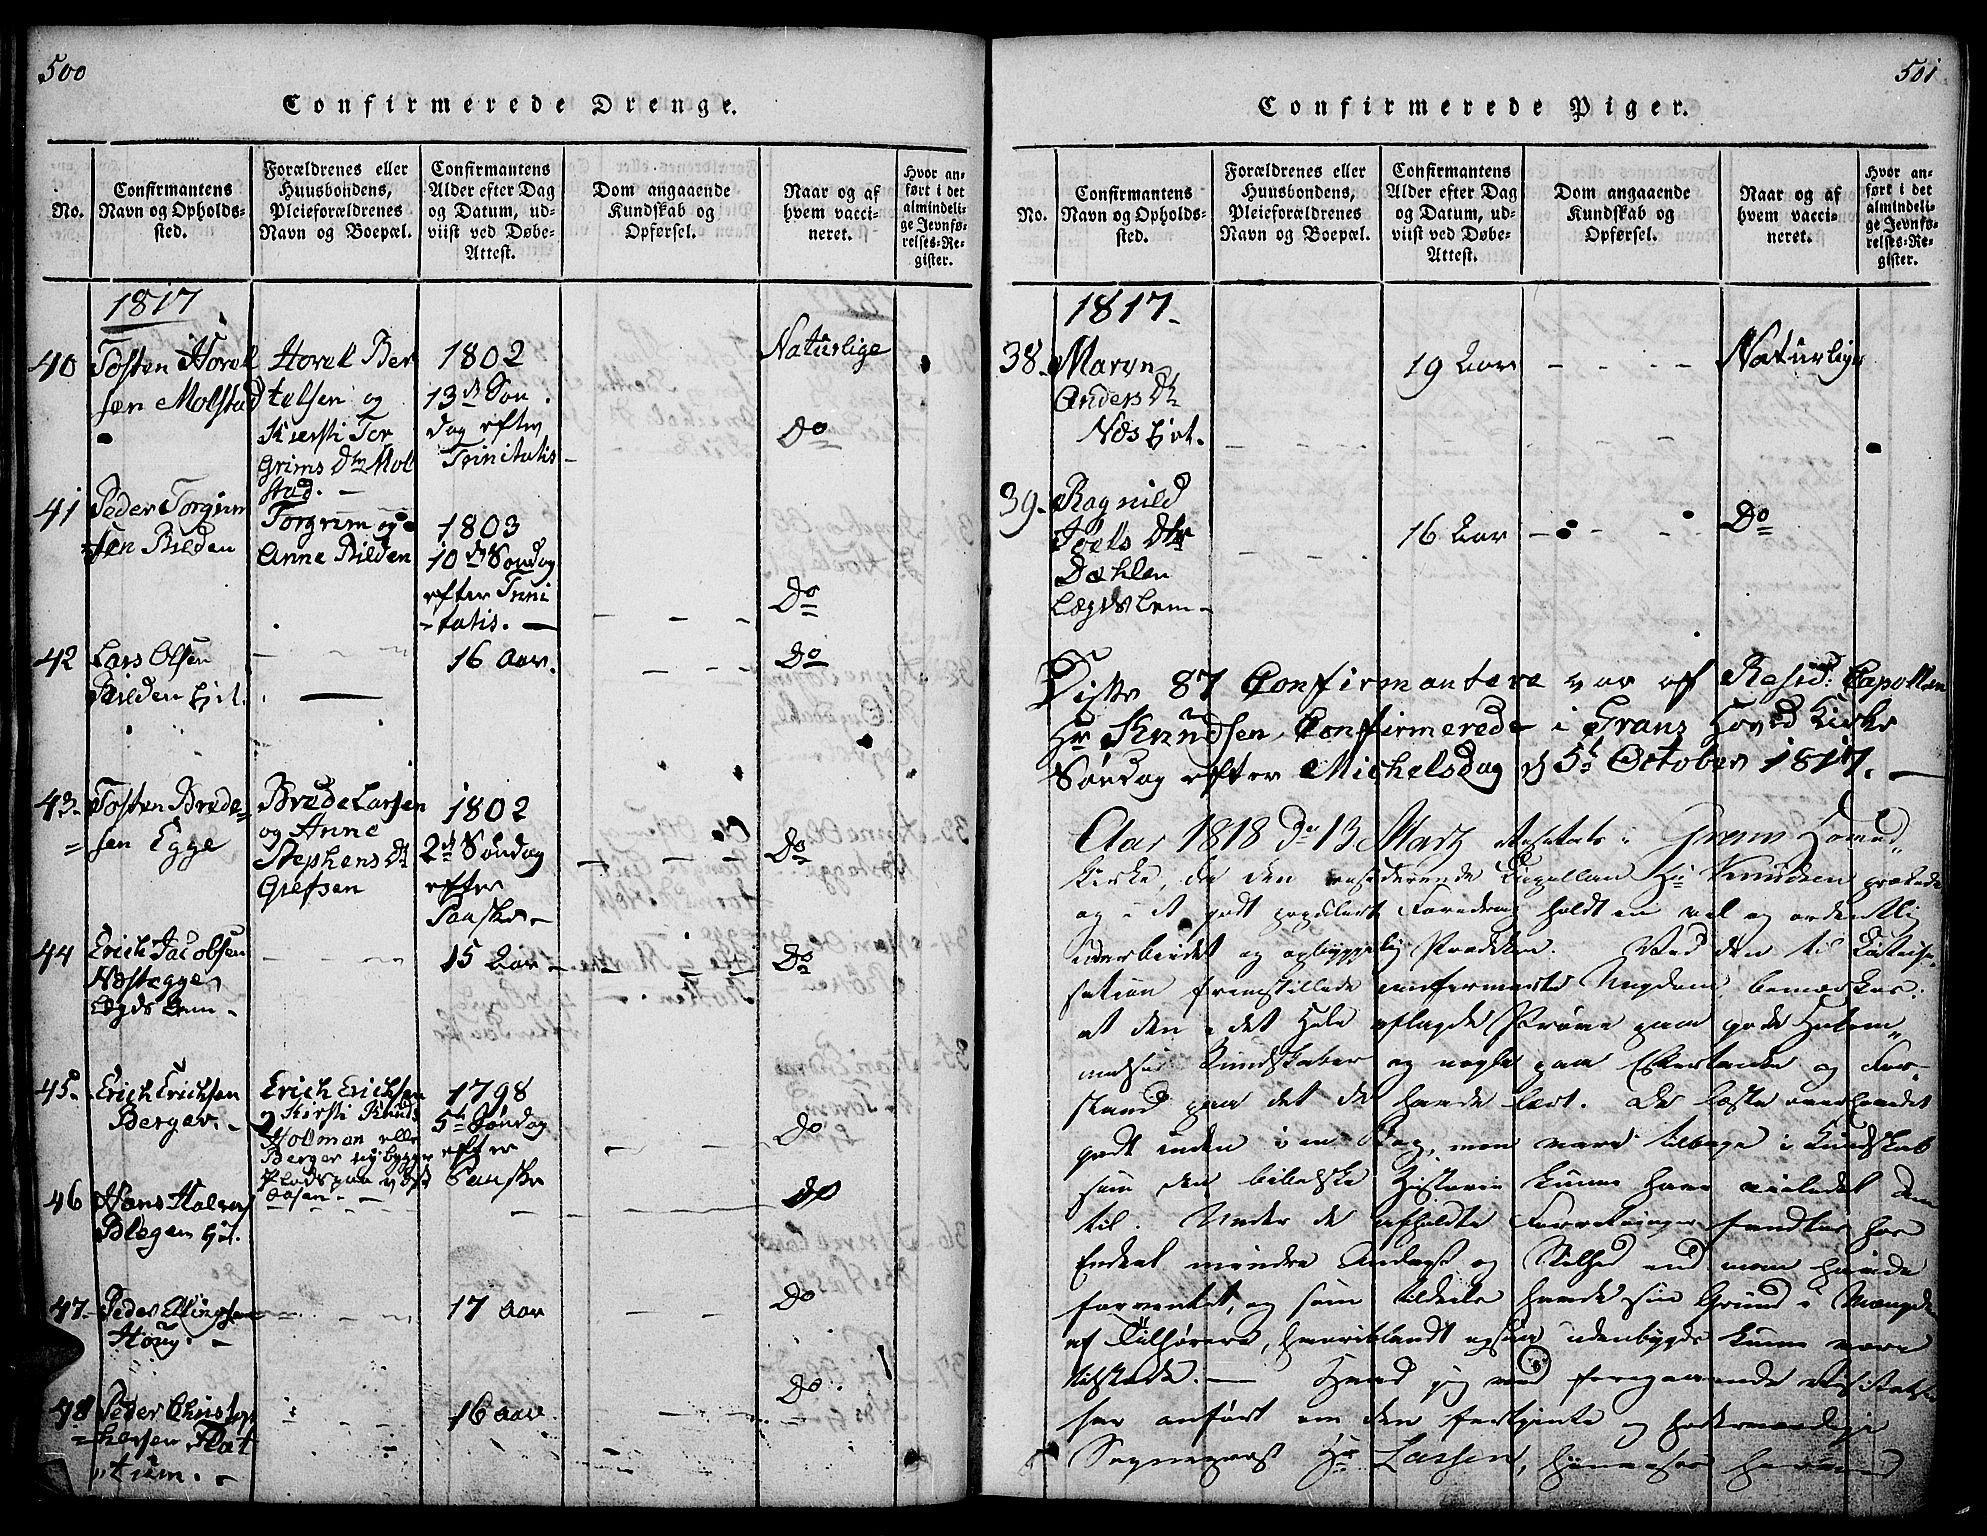 SAH, Gran prestekontor, Ministerialbok nr. 9, 1815-1824, s. 500-501